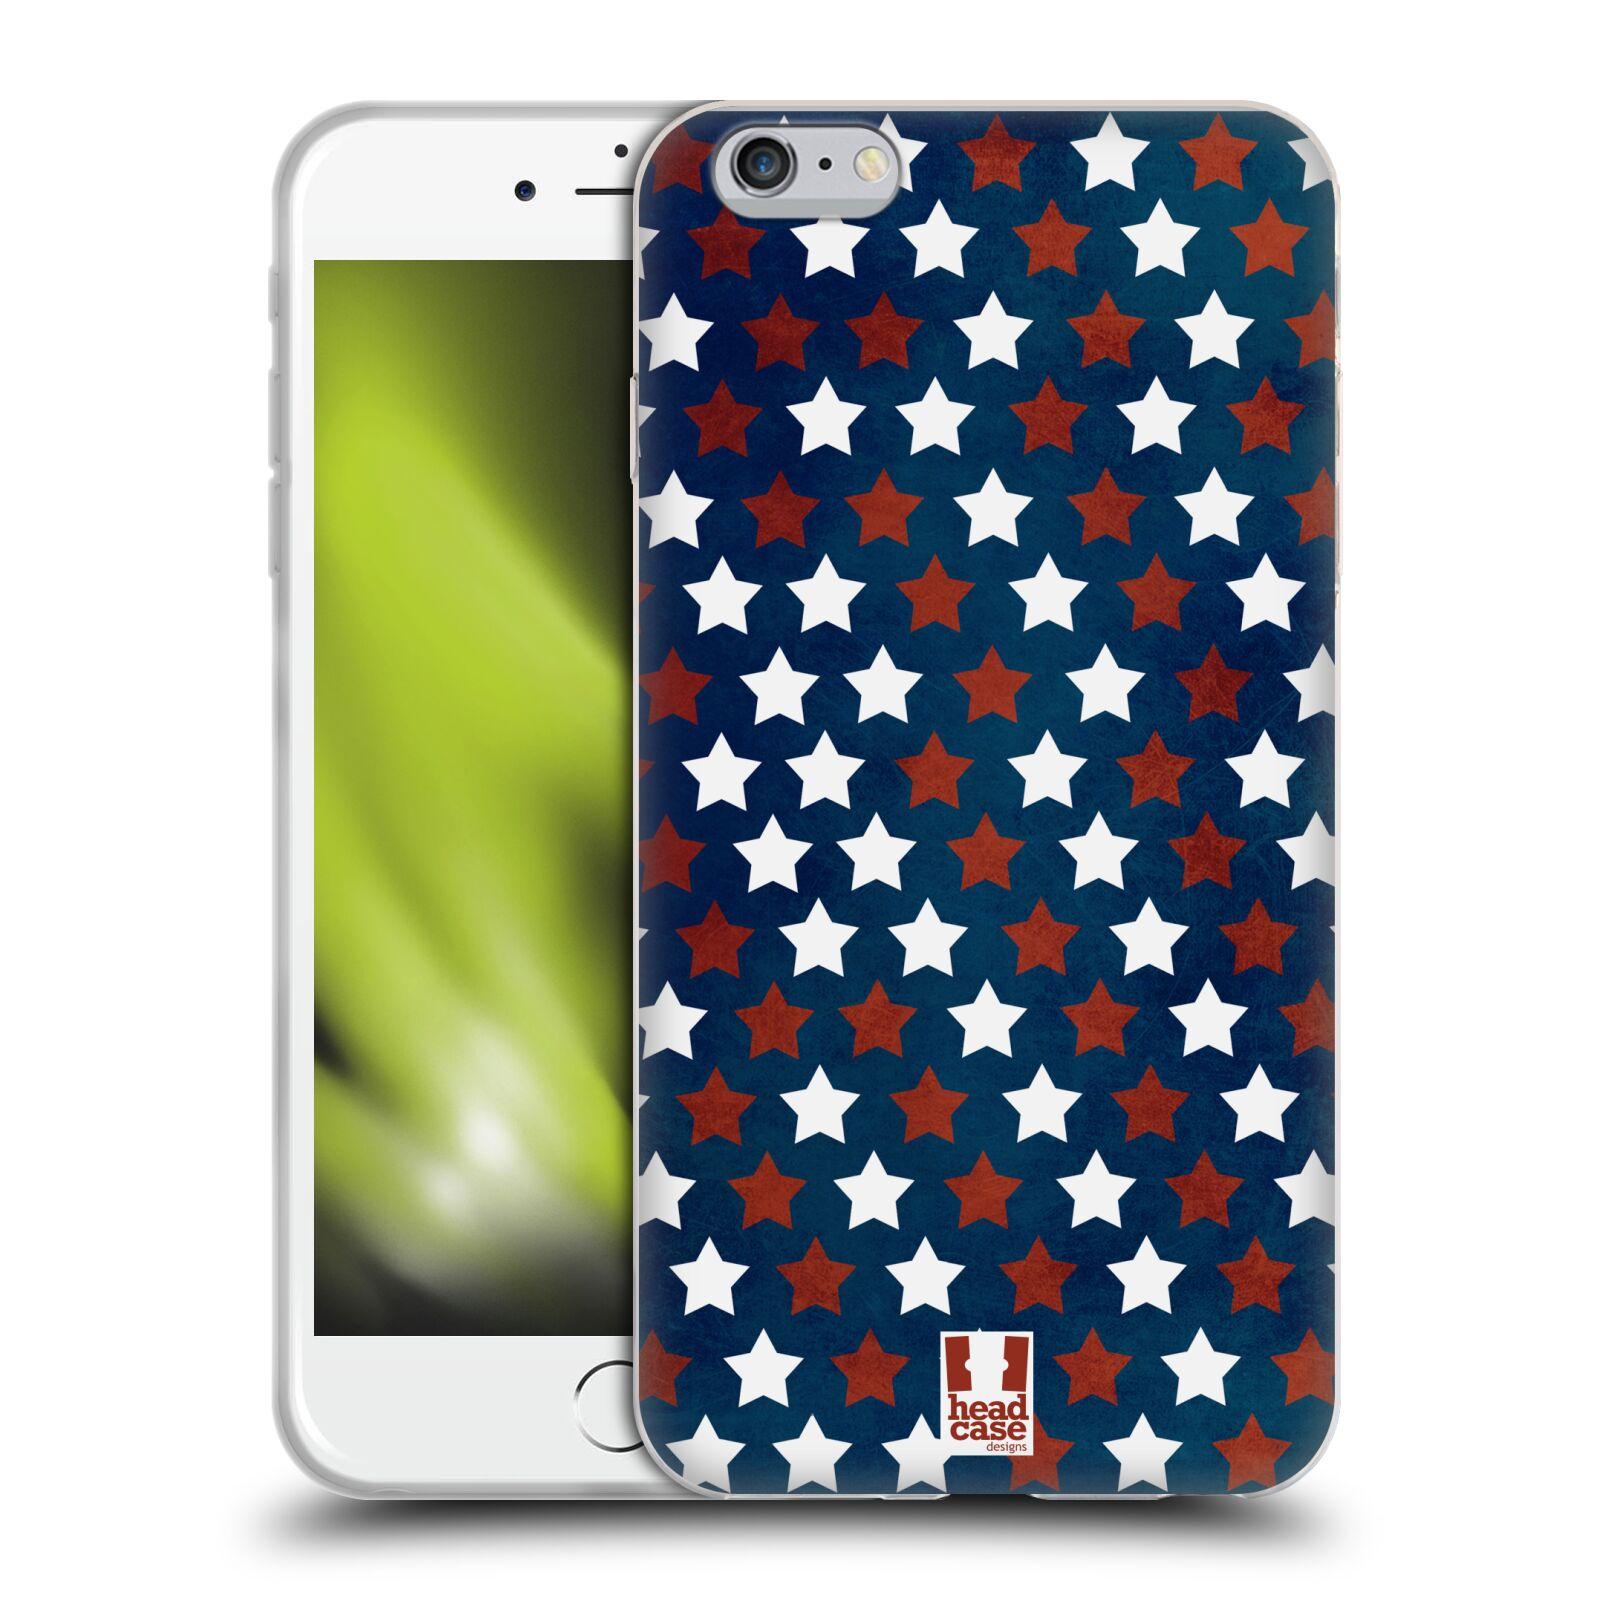 HEAD CASE silikonový obal na mobil Apple Iphone 6 PLUS/ 6S PLUS vzor USA VLAJKA HVĚZDY V MODRÉM